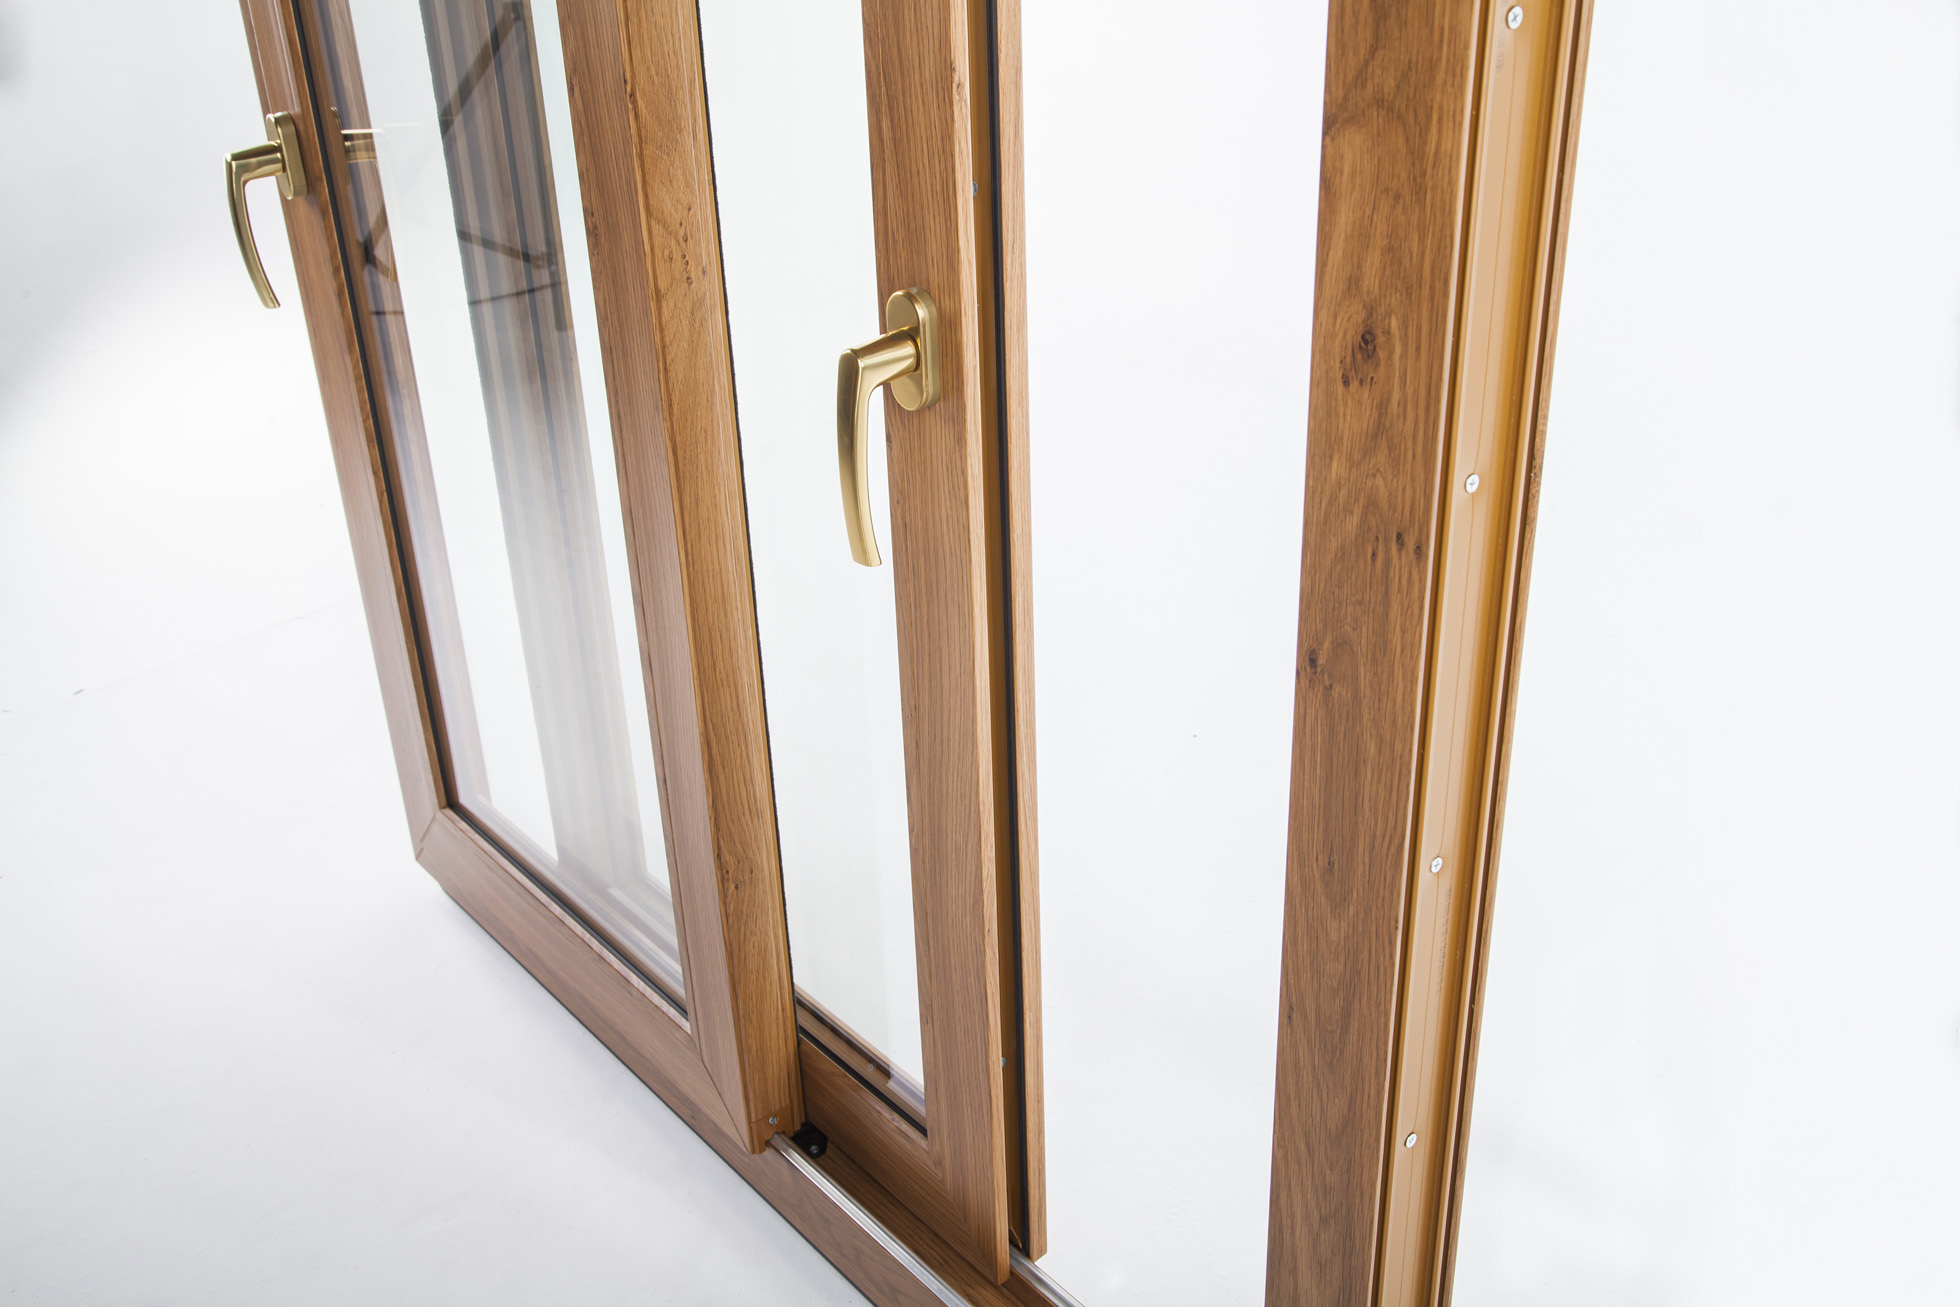 Porte finestre scorrevoli ekosol okna samoraj porte e - Porte e finestre pvc ...